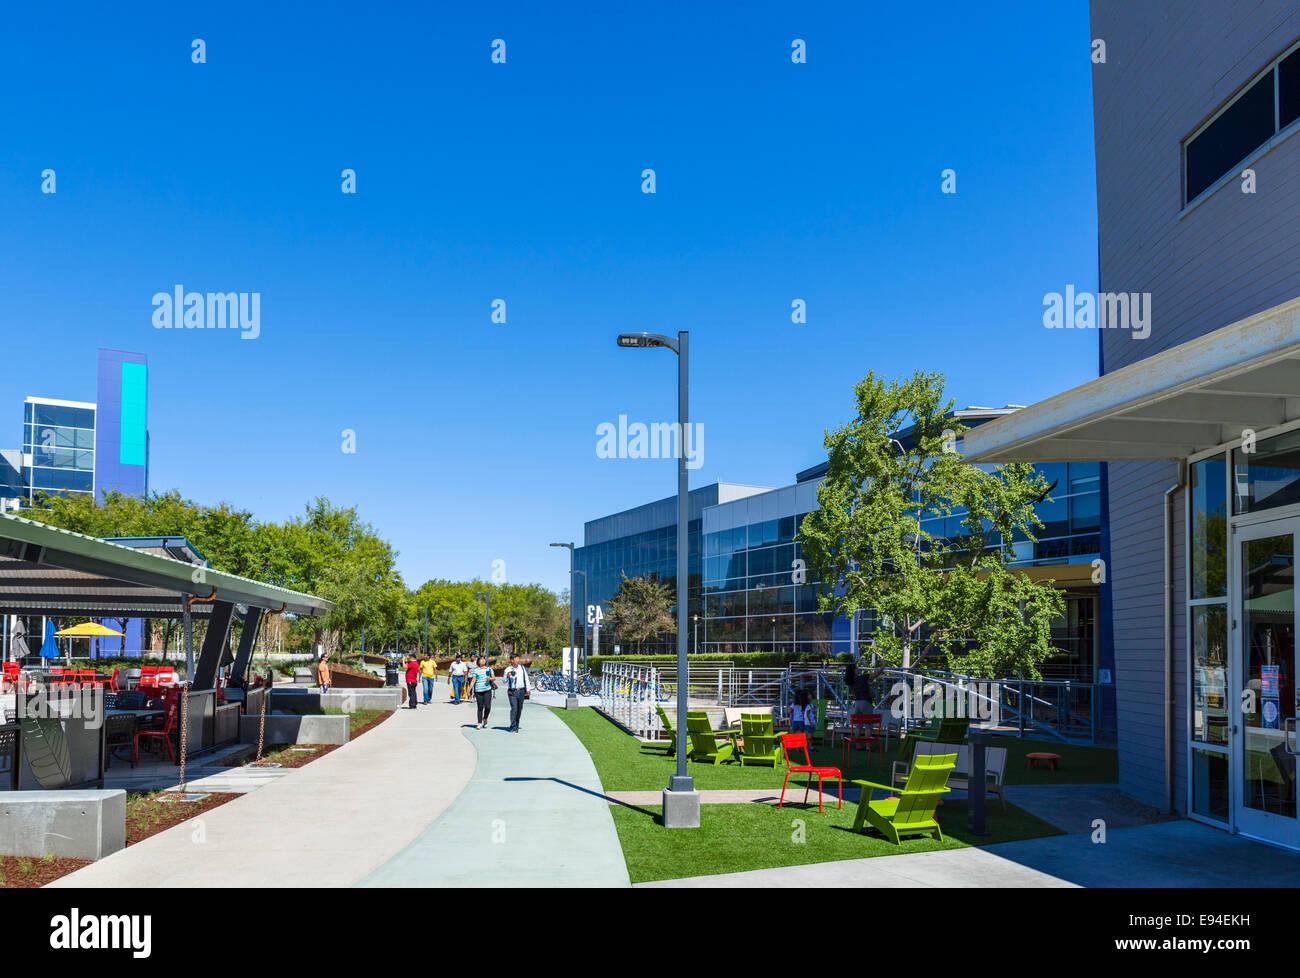 Google head office campus mountain view californias usa stock photo royalty free image - Google head office photos ...